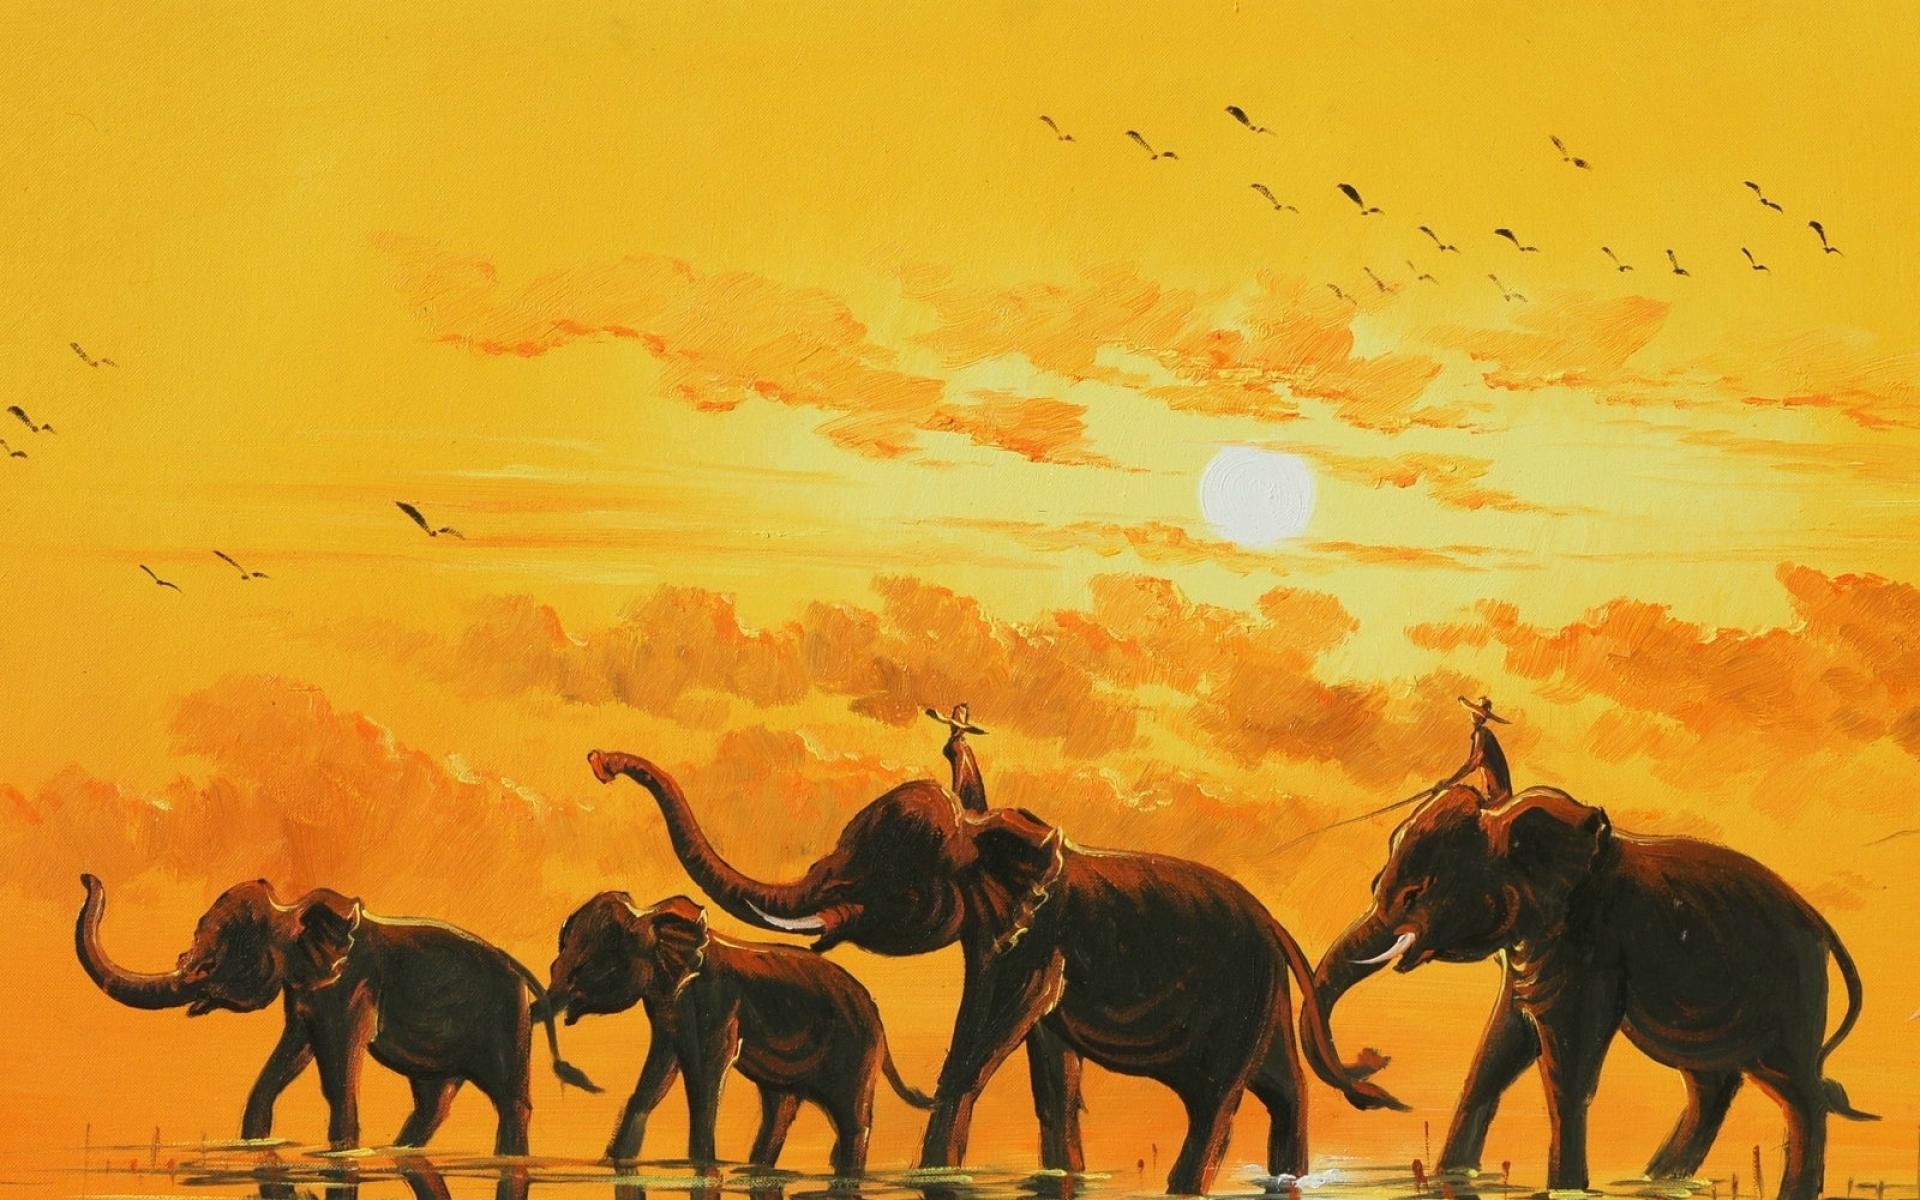 Download Art Paintings Elephant Artistic Wallpaper 1920x1200 Full HD 1920x1200